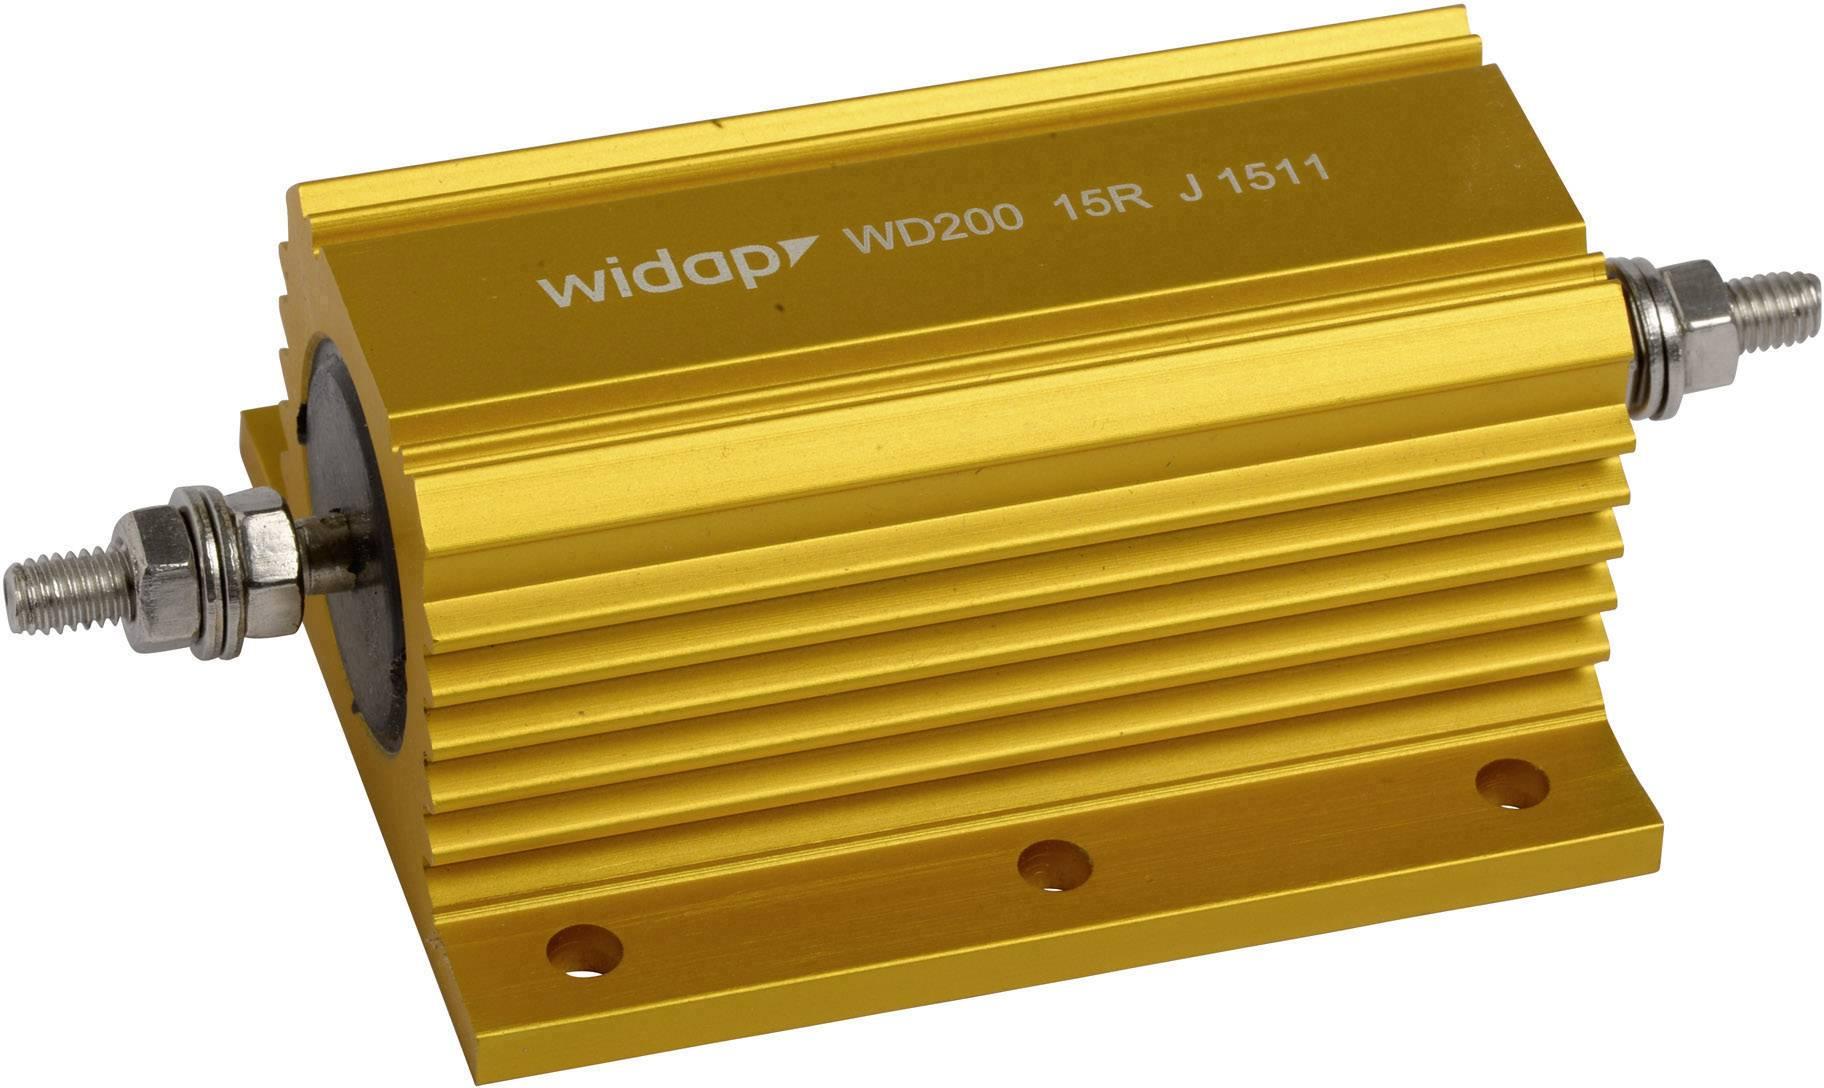 Drôtový rezistor Widap 160153, hodnota odporu 33 Ohm, 200 W, 1 ks